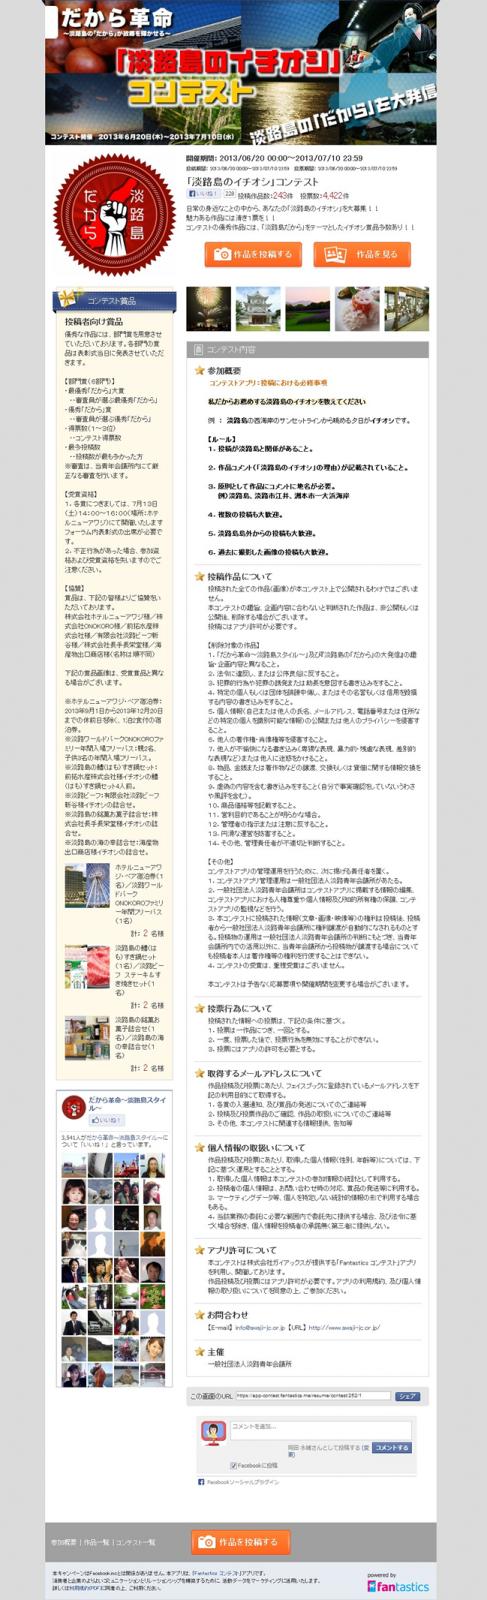 Fantastics 投稿&投票コンテスト(一般社団法人淡路青年会議様)